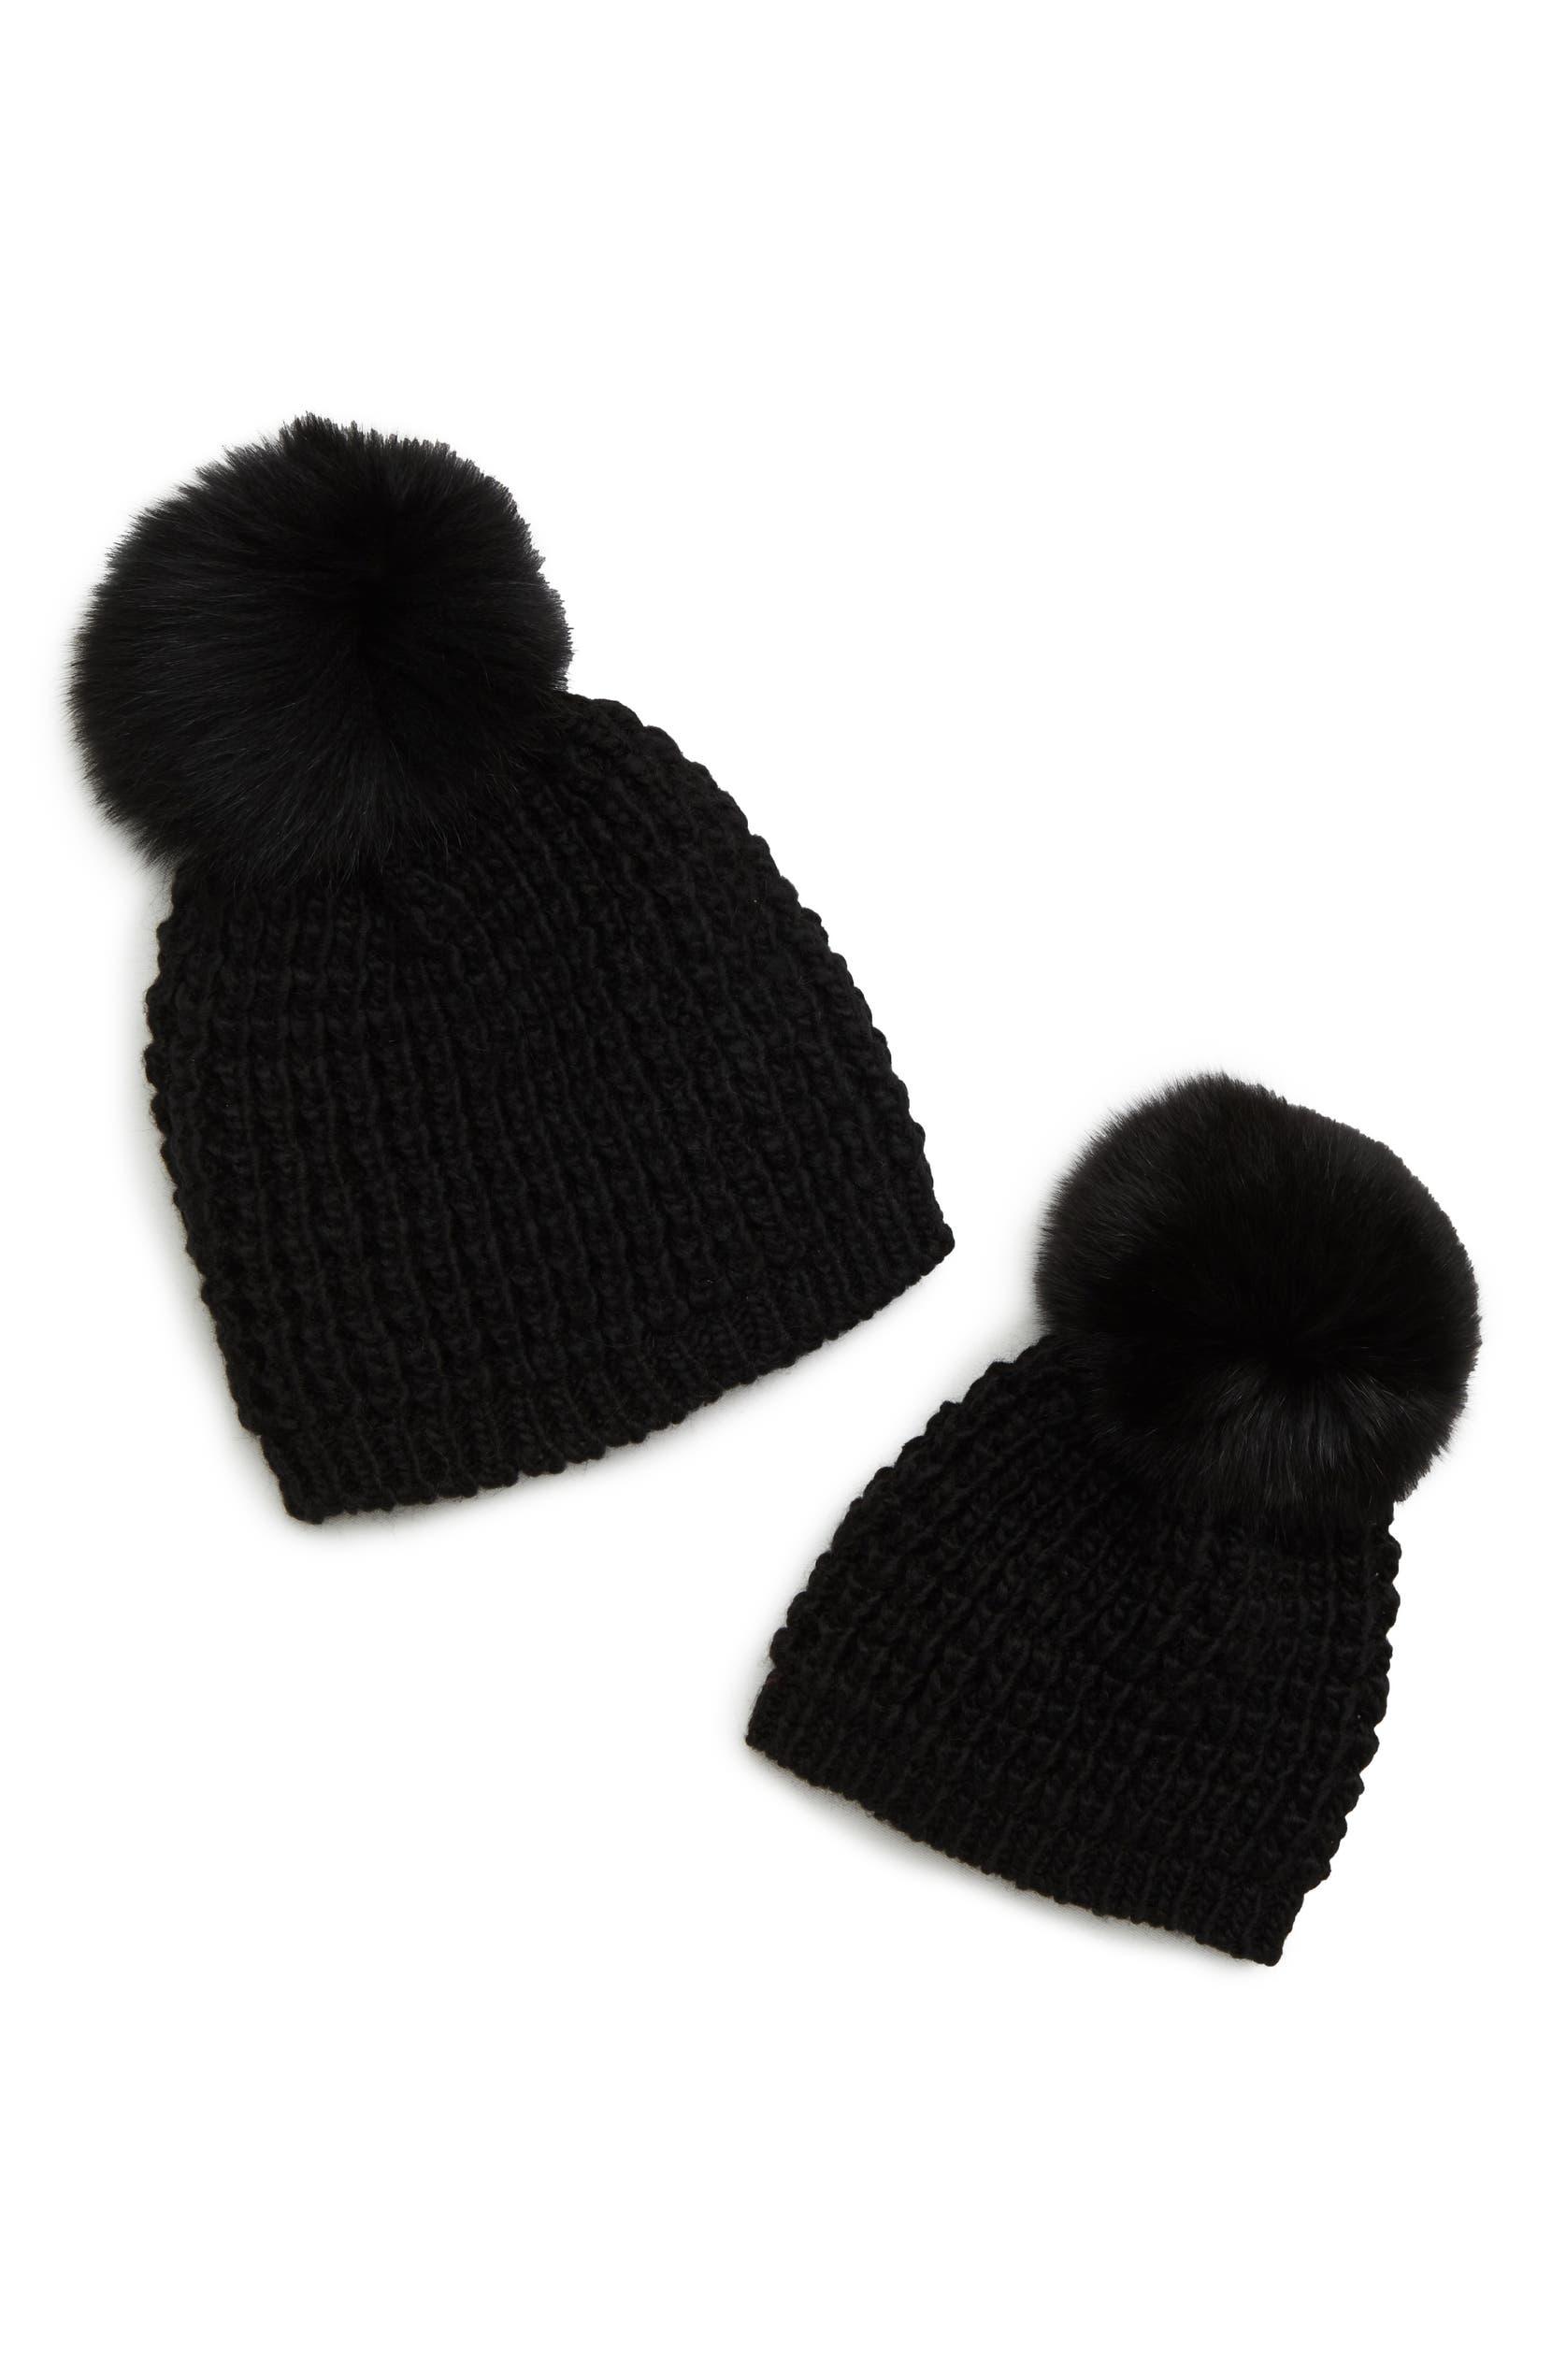 Kyi Kyi Mom   Me Knit Hats with Genuine Fox Fur Poms Set  88b62c96778